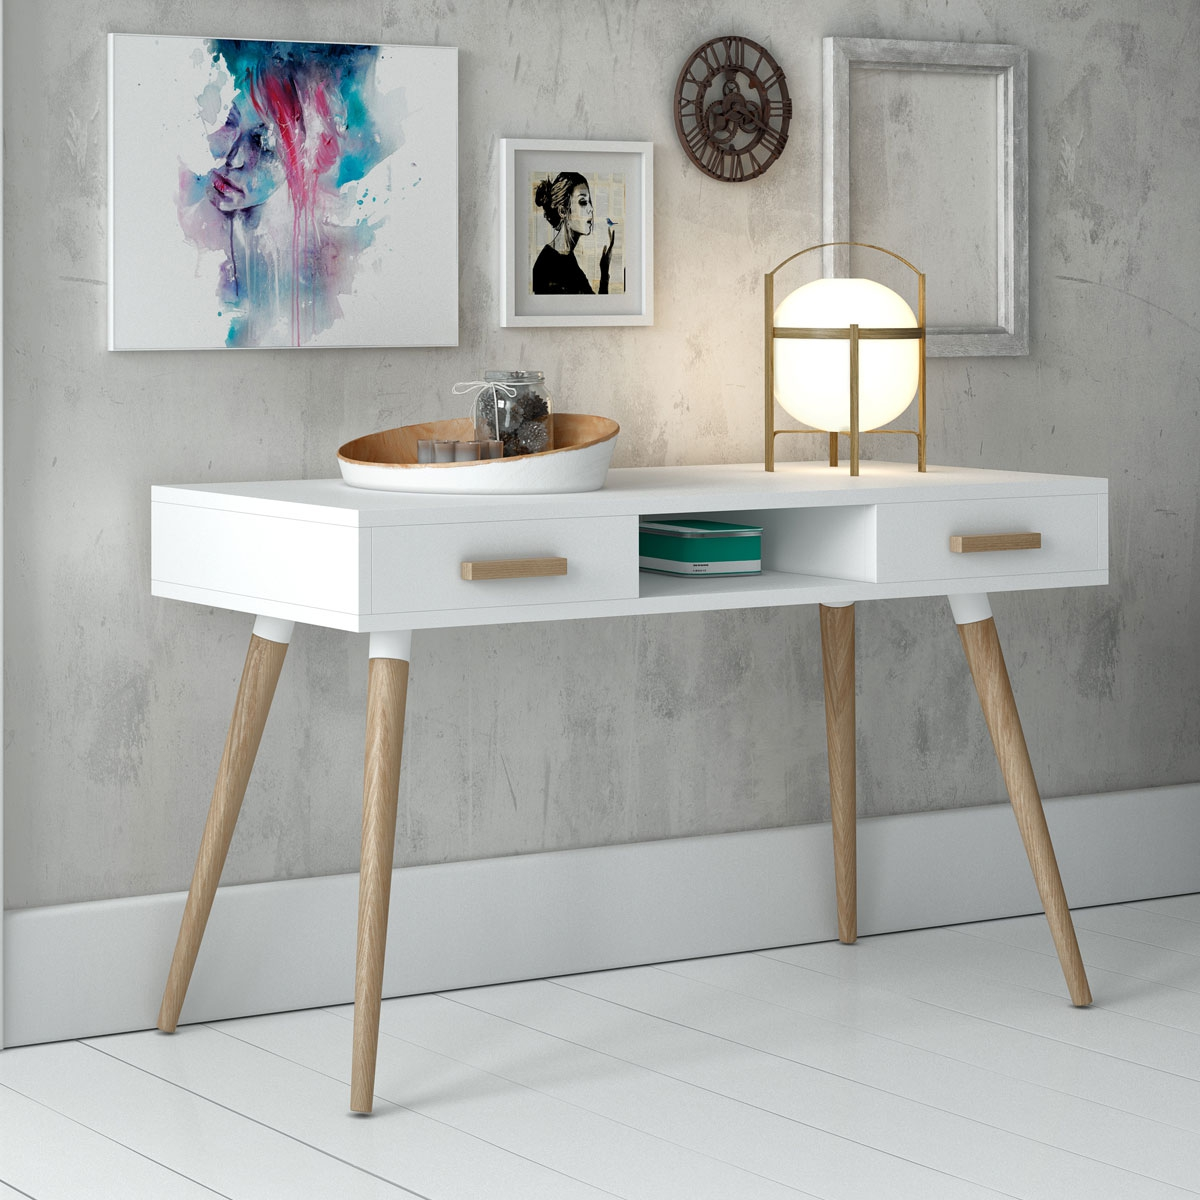 Interior Design Inspirations: Interior Design Inspiration: Scandinavian Console Tables